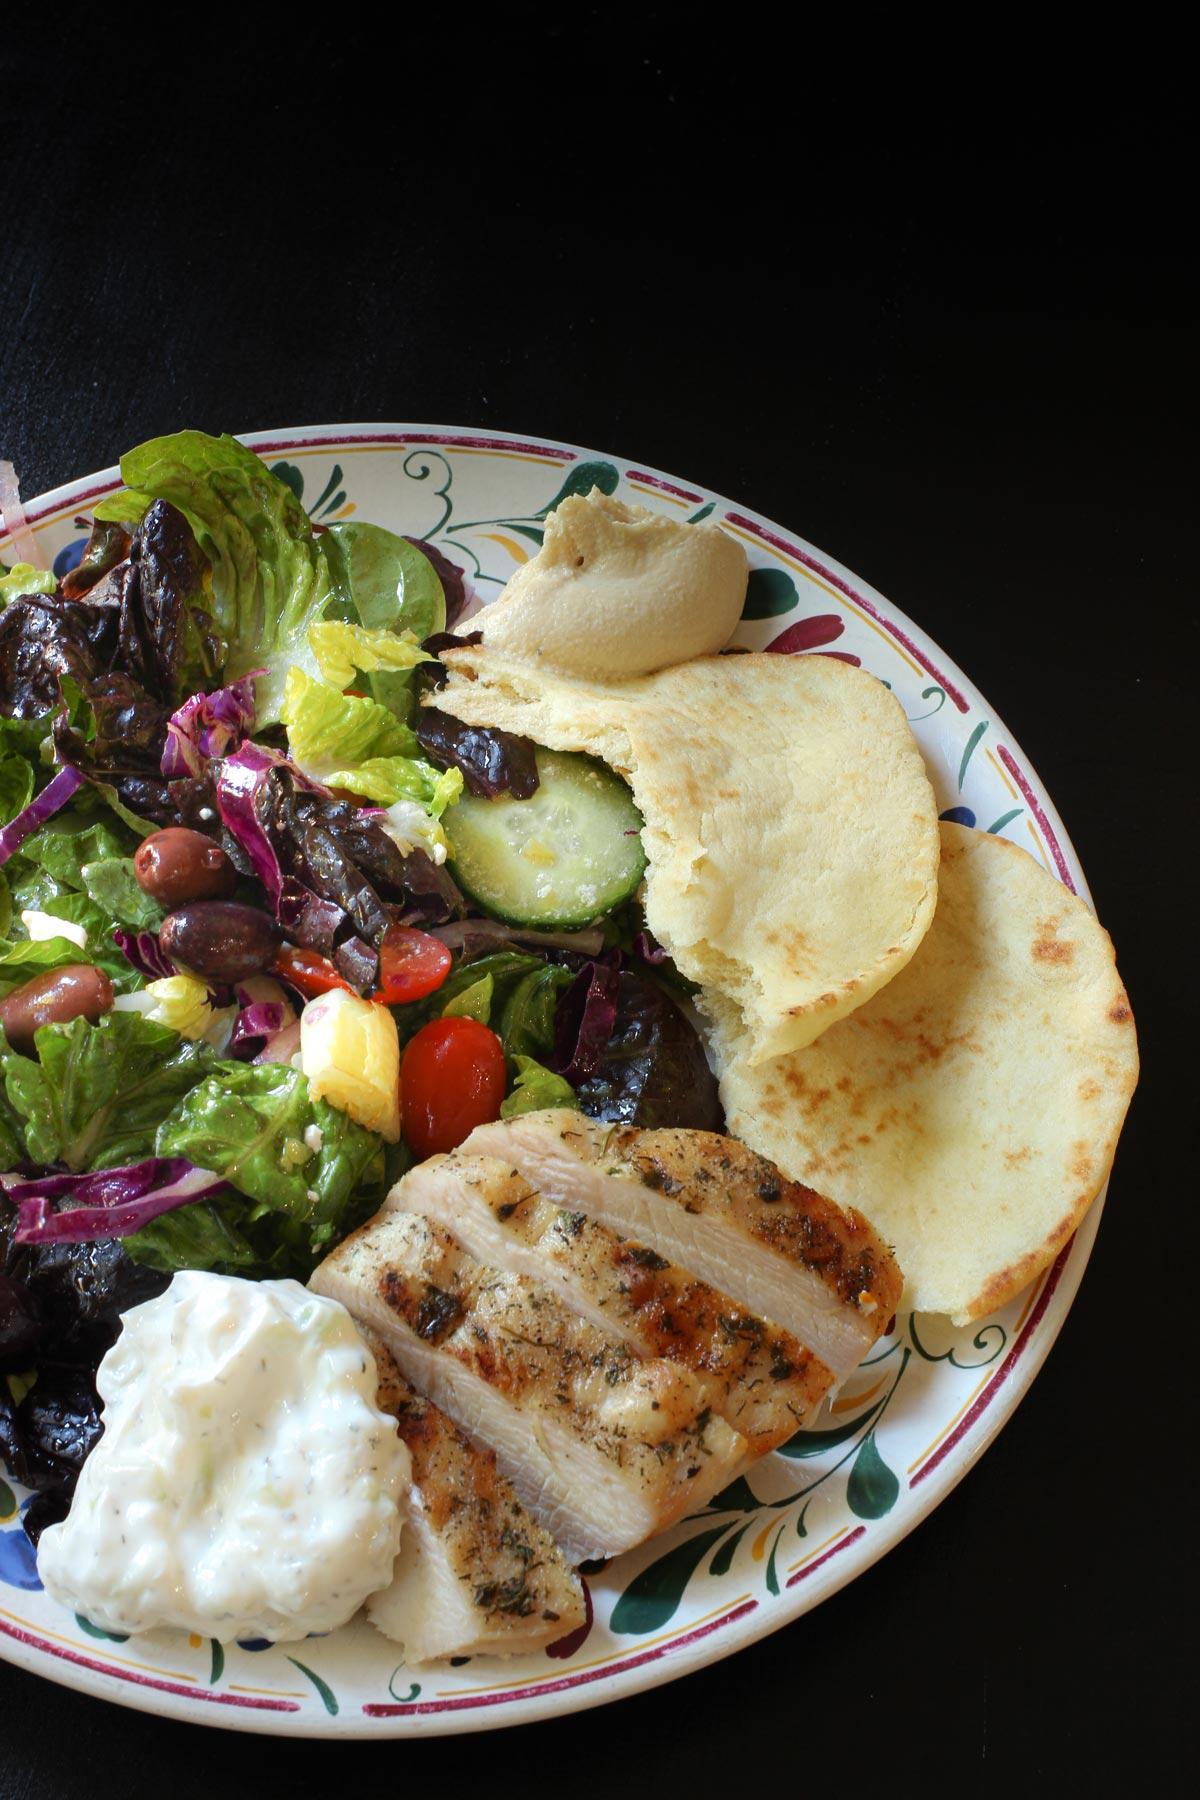 greek meal of grilled chicken with Greek seasoning, pita, salad, and tzatziki.